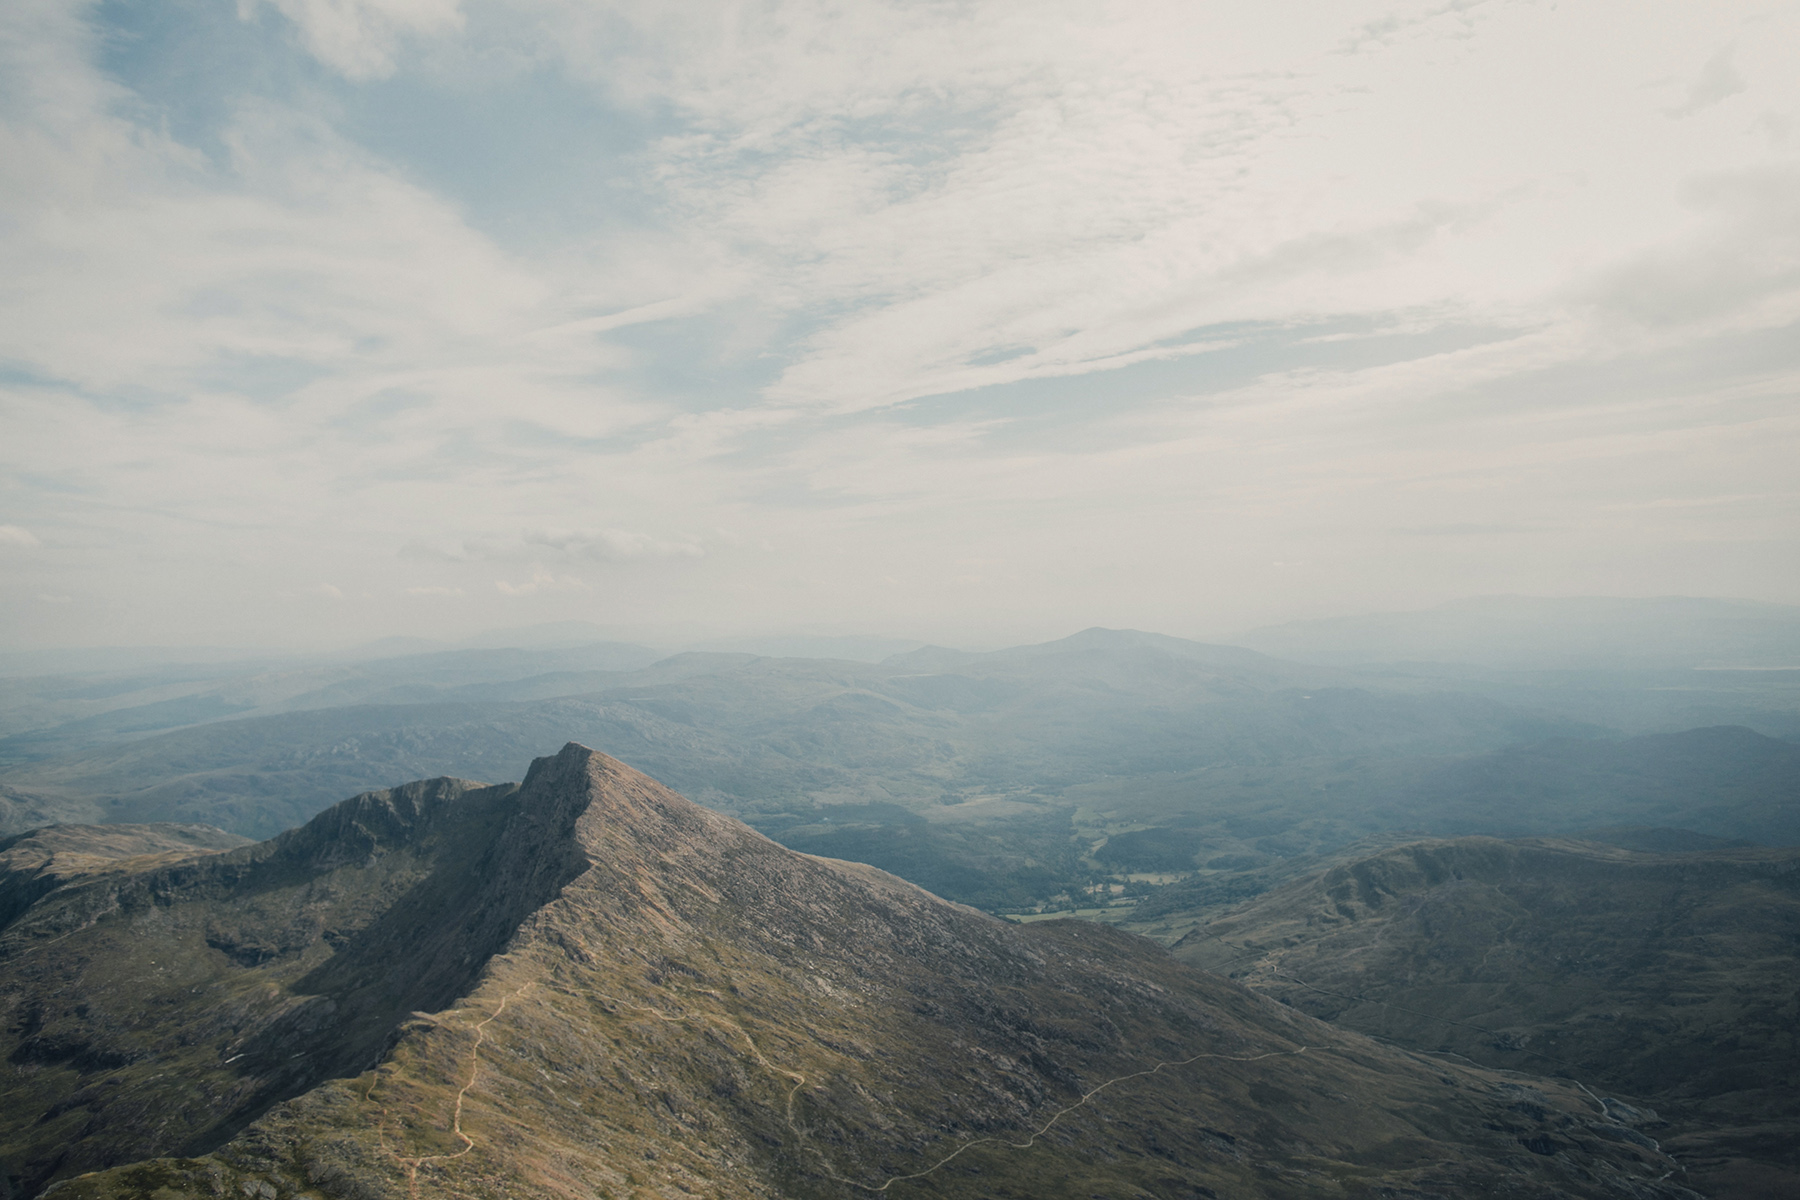 Mt-Snowdon-Hike-Photos-From-Peny-Pass-00191.jpg